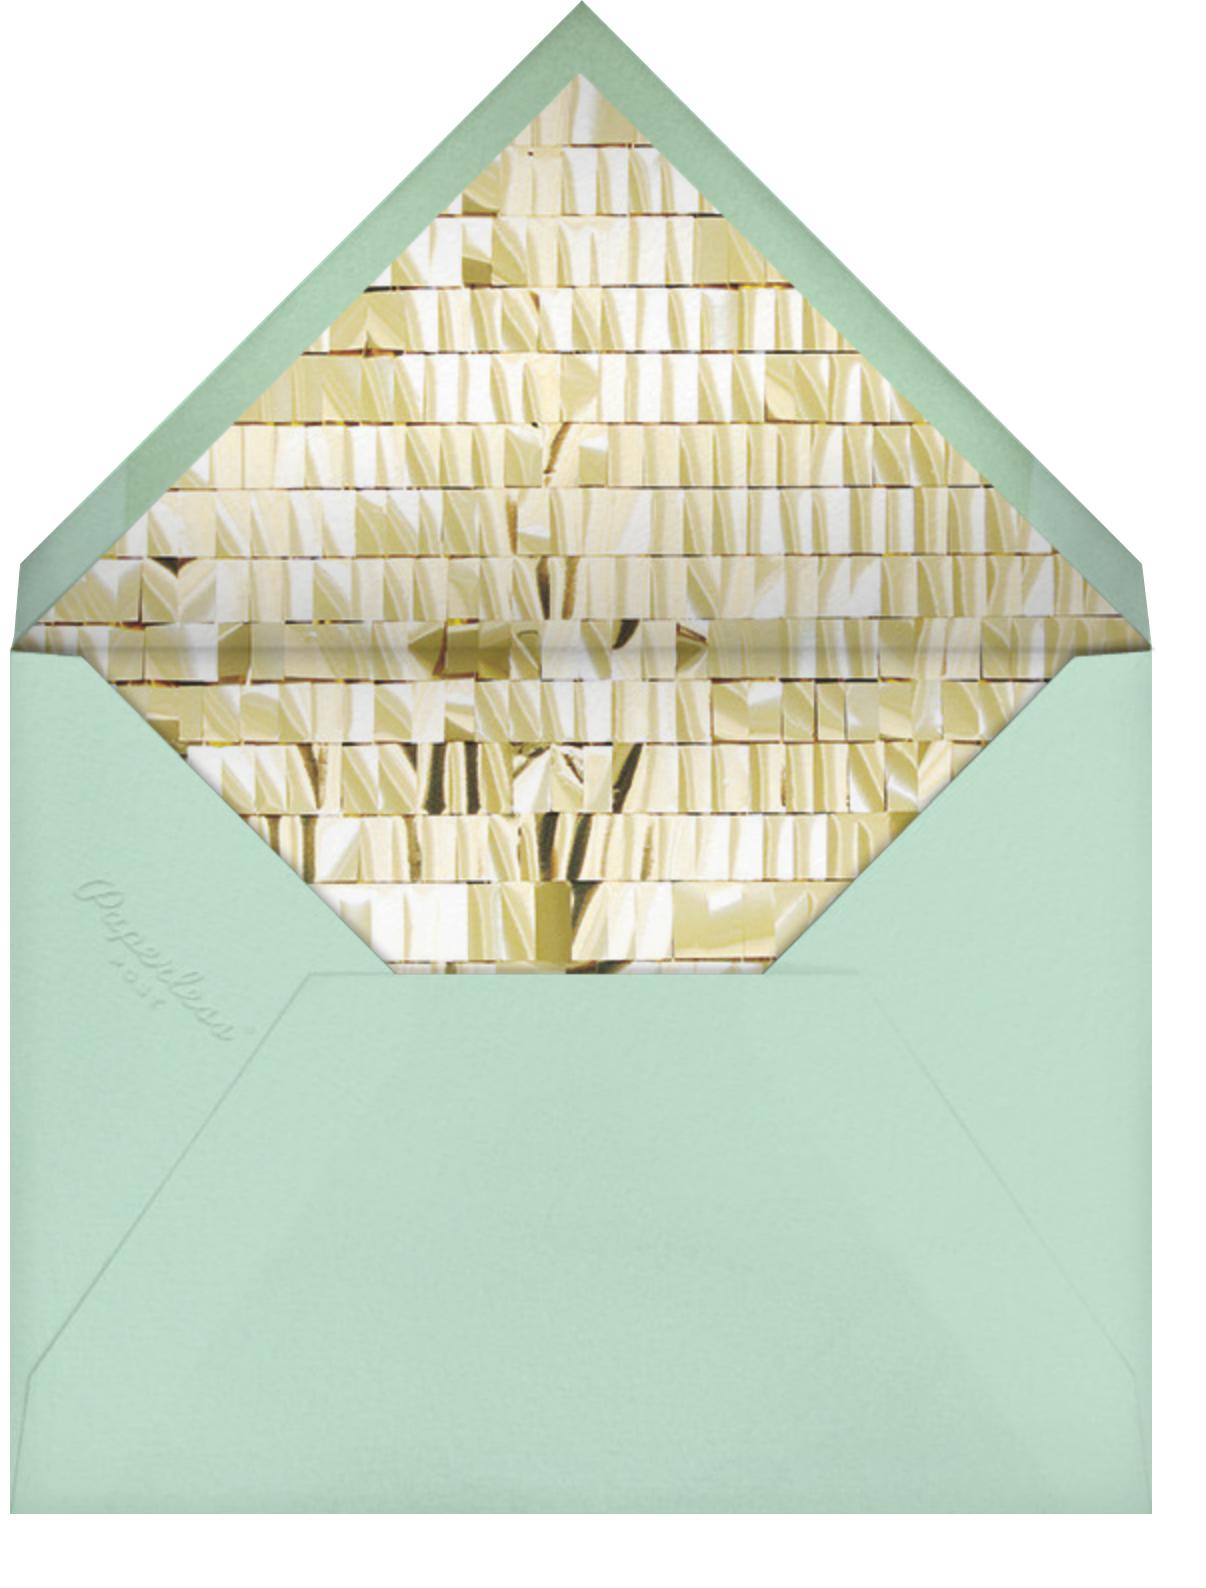 Spark - White/Gold - CONFETTISYSTEM - Just because - envelope back